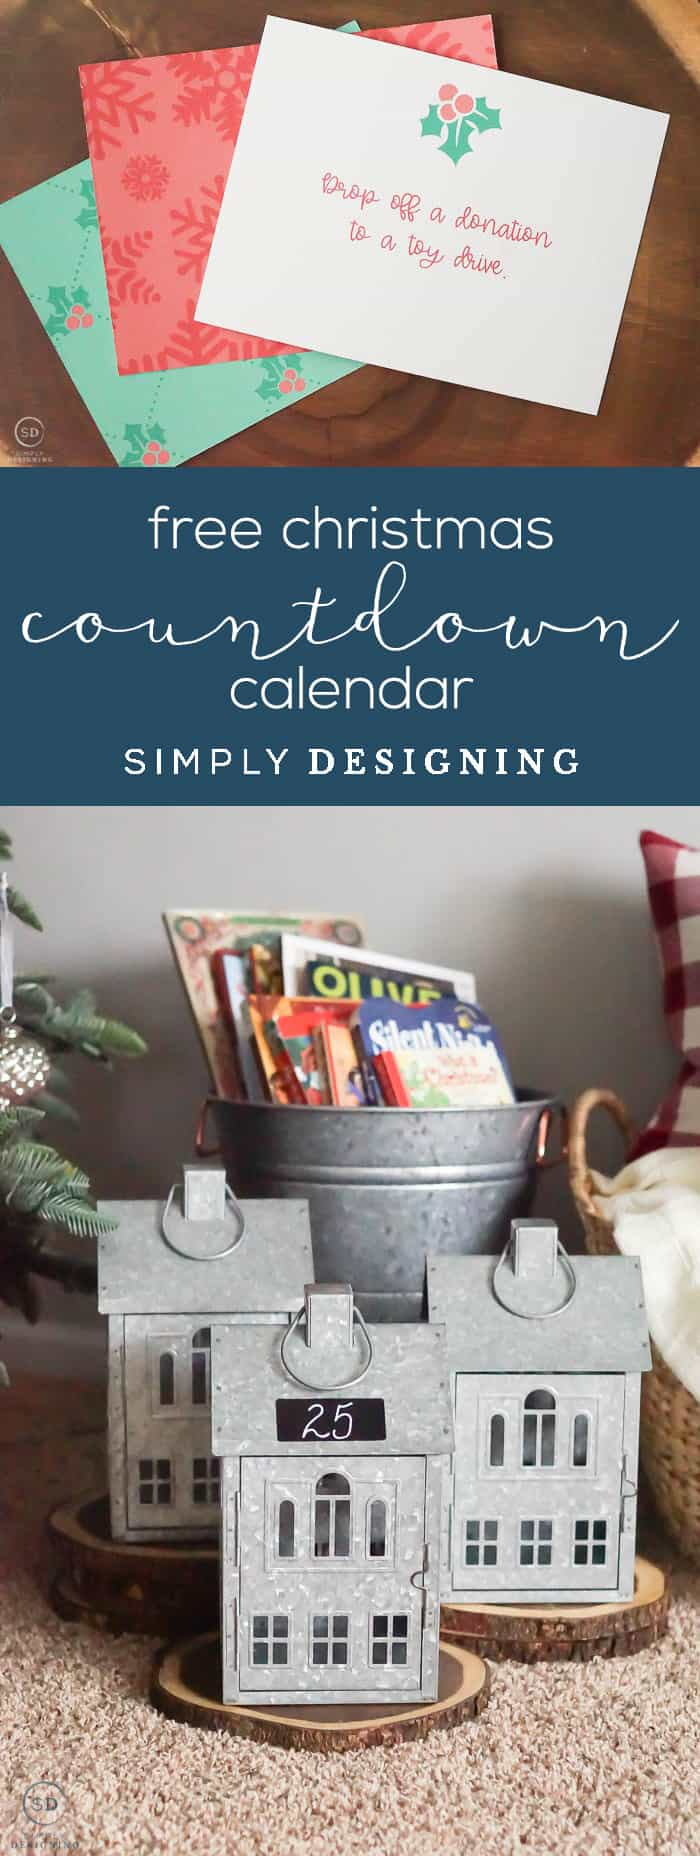 Free Printable Countdown Calendar - #ad #bhghowiholiday #bhglivebetter #bhgatwalmart @BHGLiveBetter